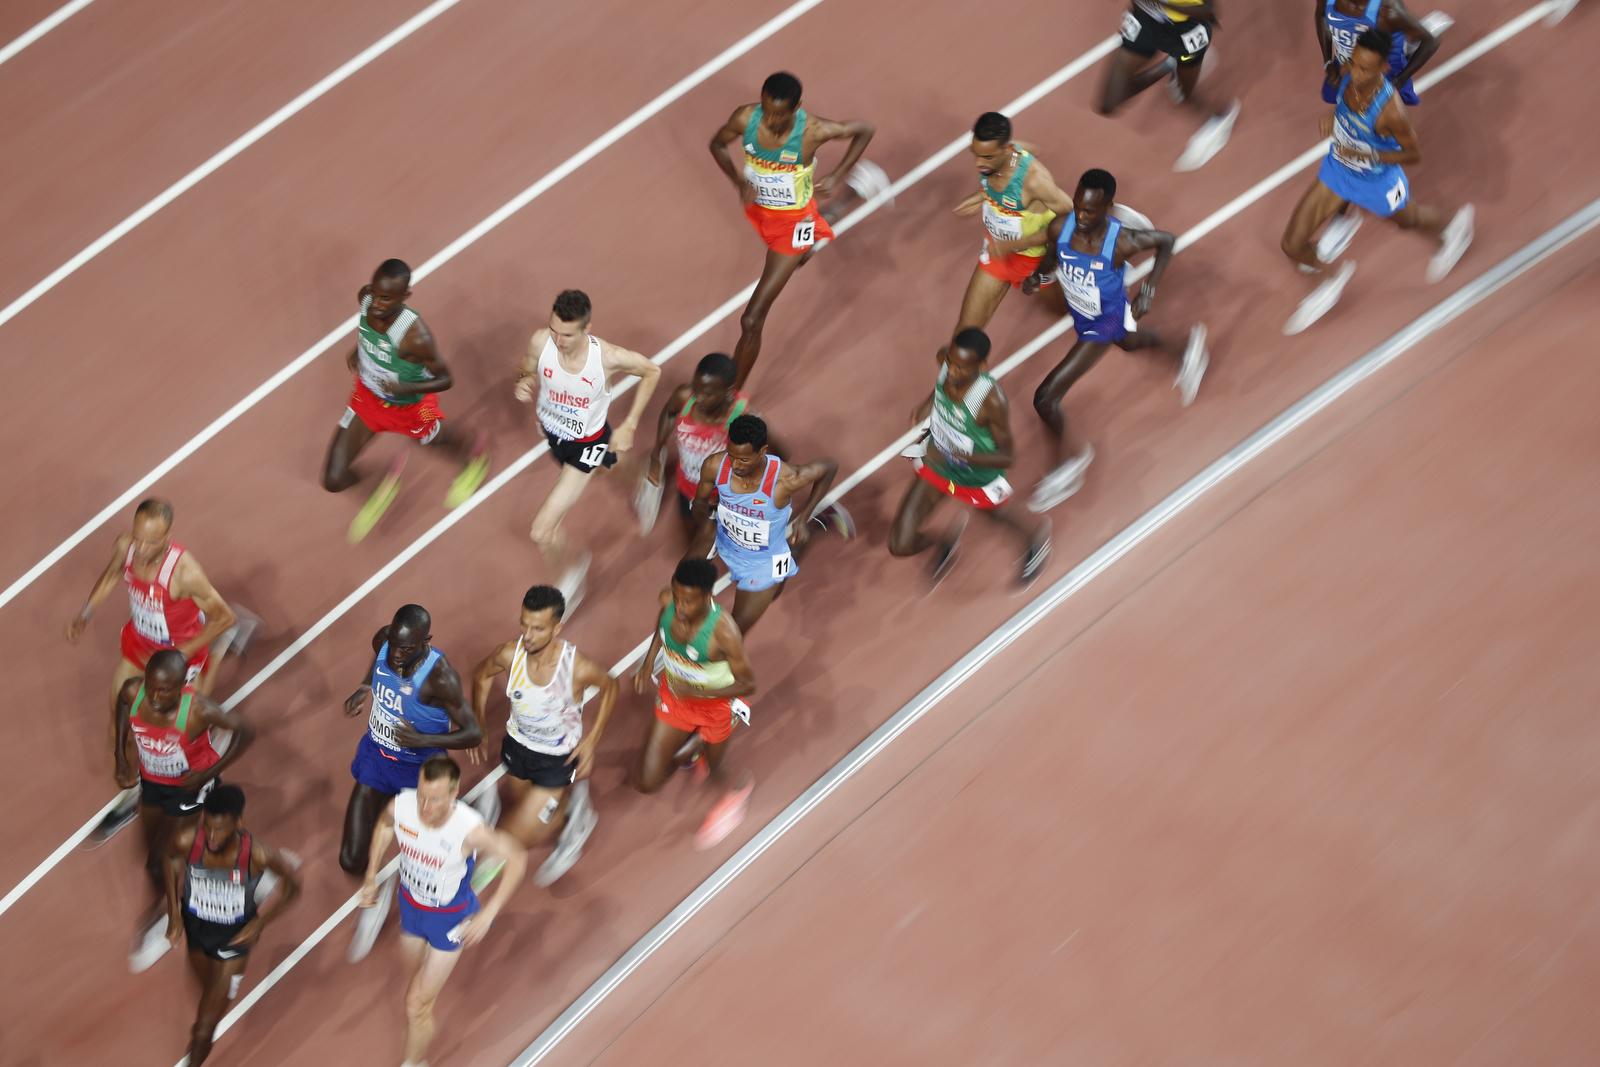 Athletics - World Athletics Championships - Doha 2019 - Men's 10,000 Metres Final - Khalifa International Stadium, Doha, Qatar - October 6, 2019 Ethiopia's Yomif Kejelcha, Switzerland's Julien Wanders and Eritrea's Aron Kifle in action REUTERS